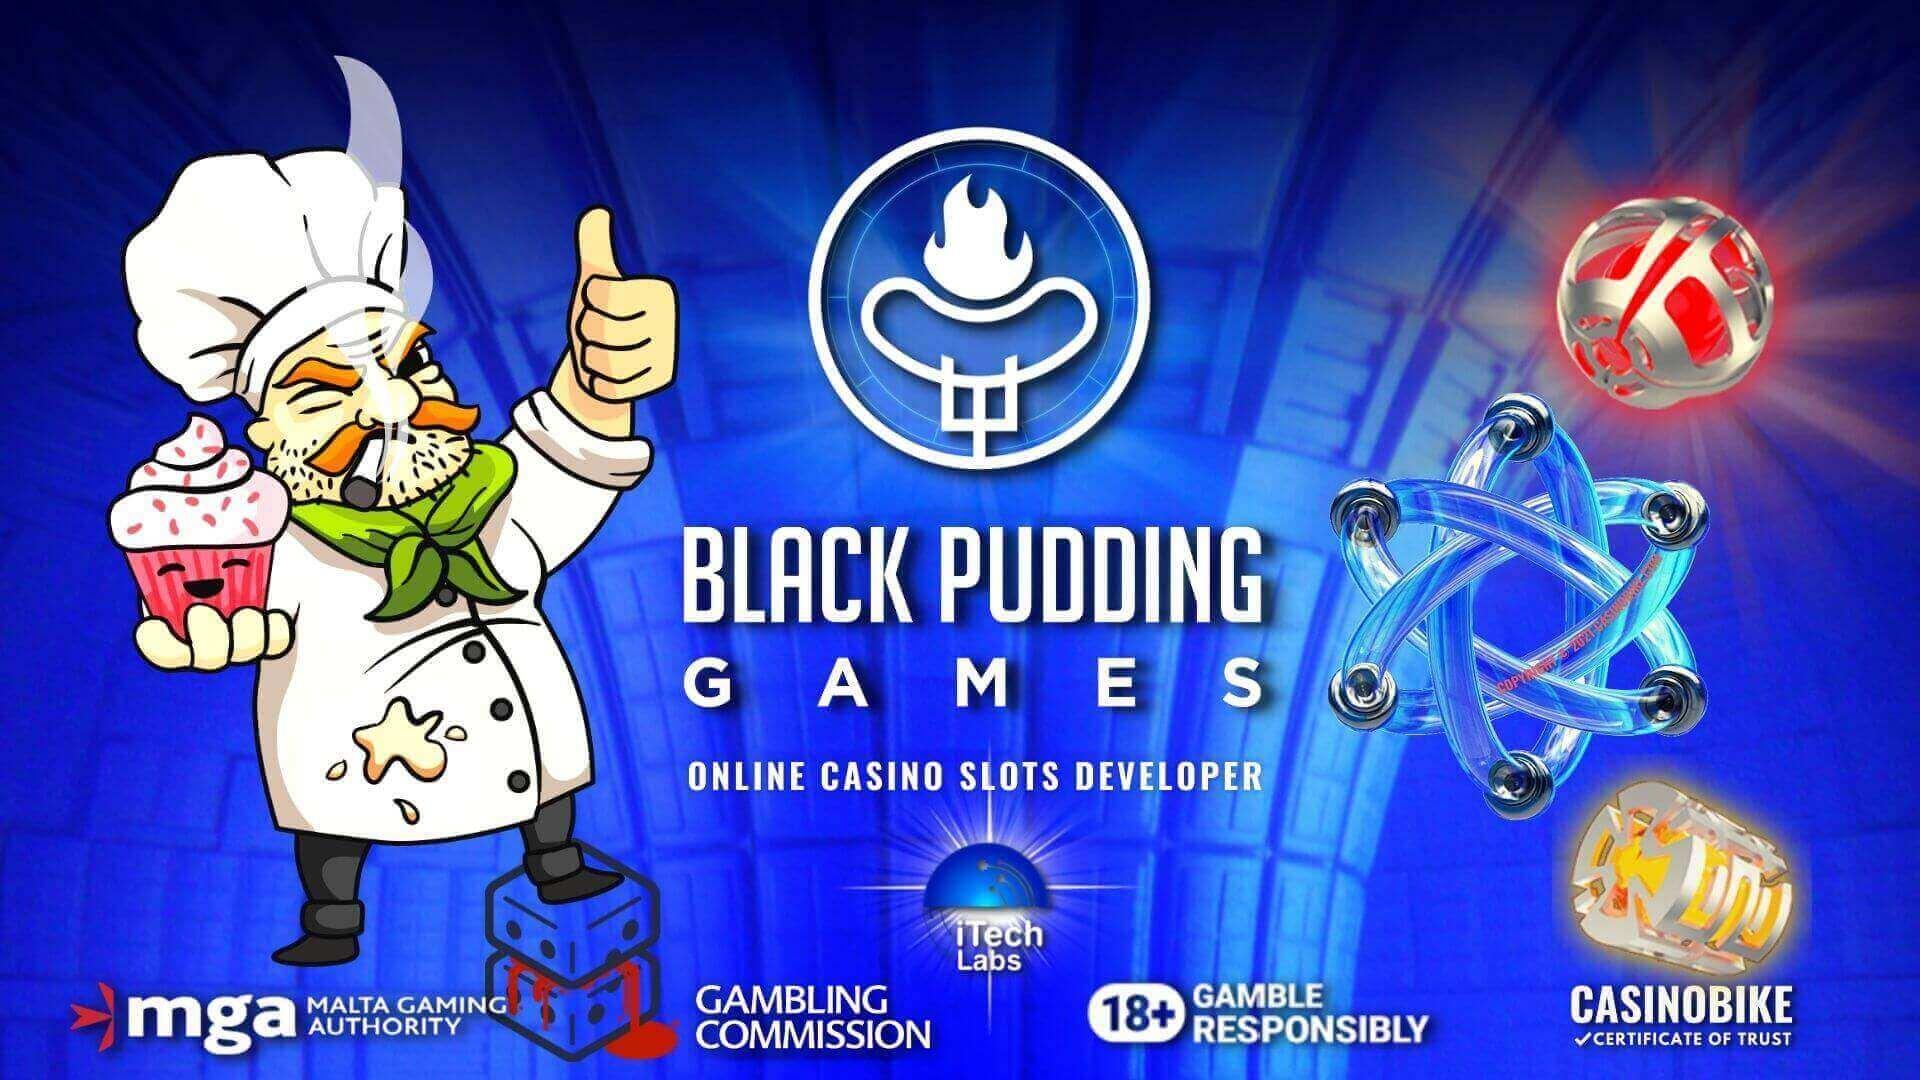 Black Pudding Games Online Casino Slots Developer